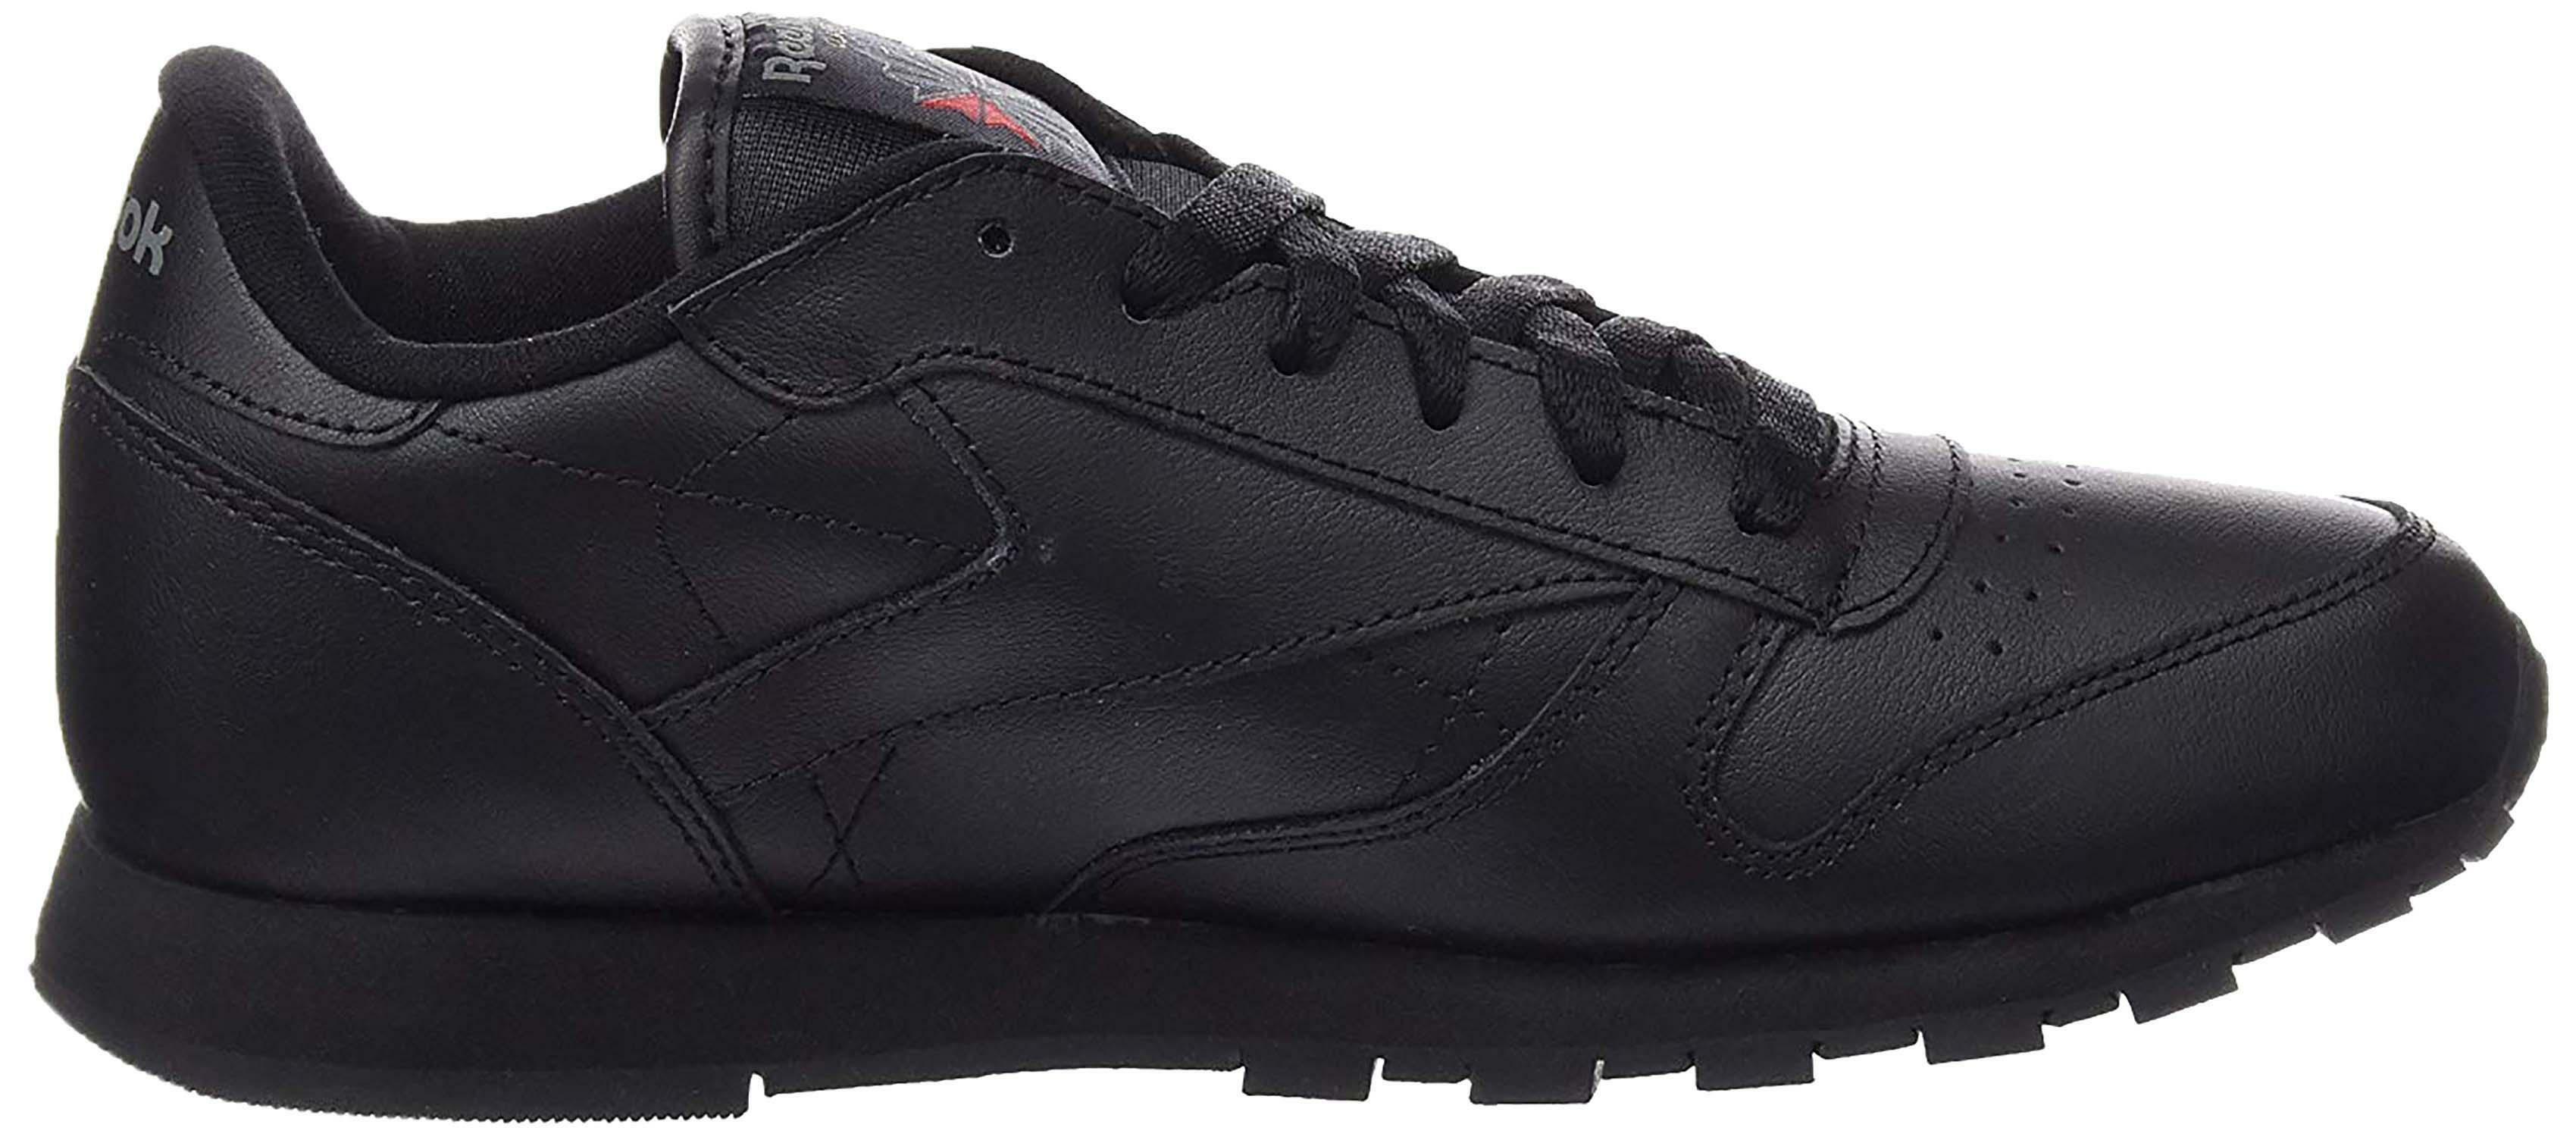 Reebok classic leather scarpe sportive bambino nere 50170